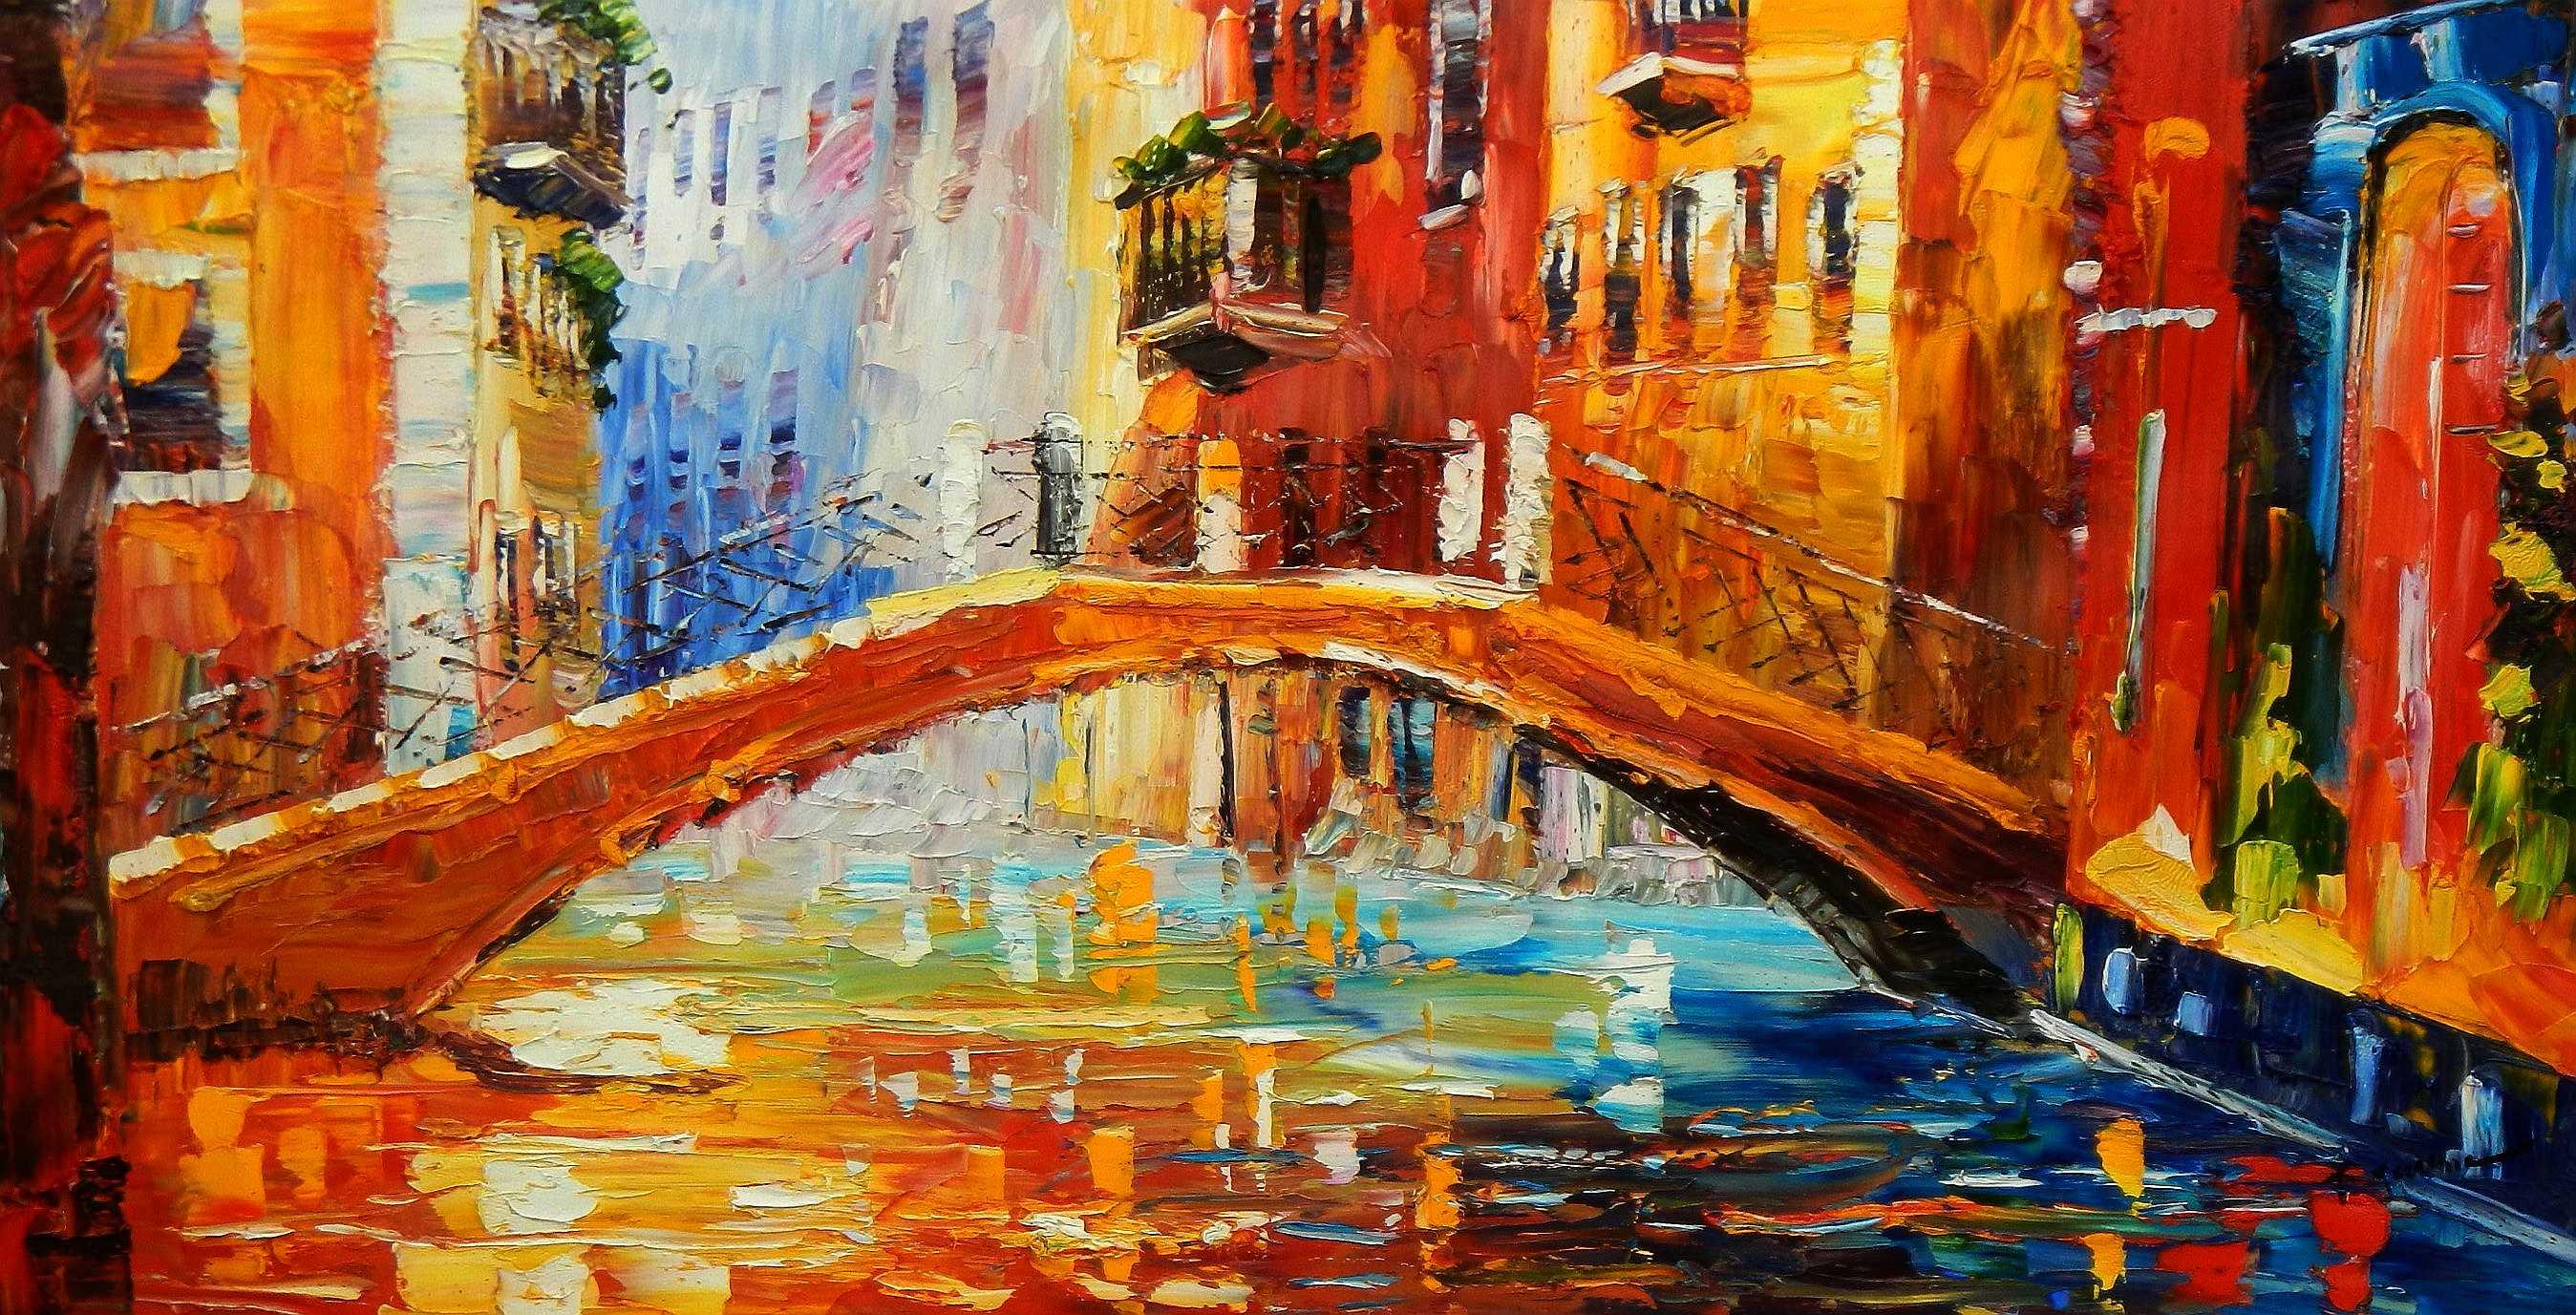 Modern Art - Kanalansicht in Venedig f94916 60x120cm abstraktes Ölbild